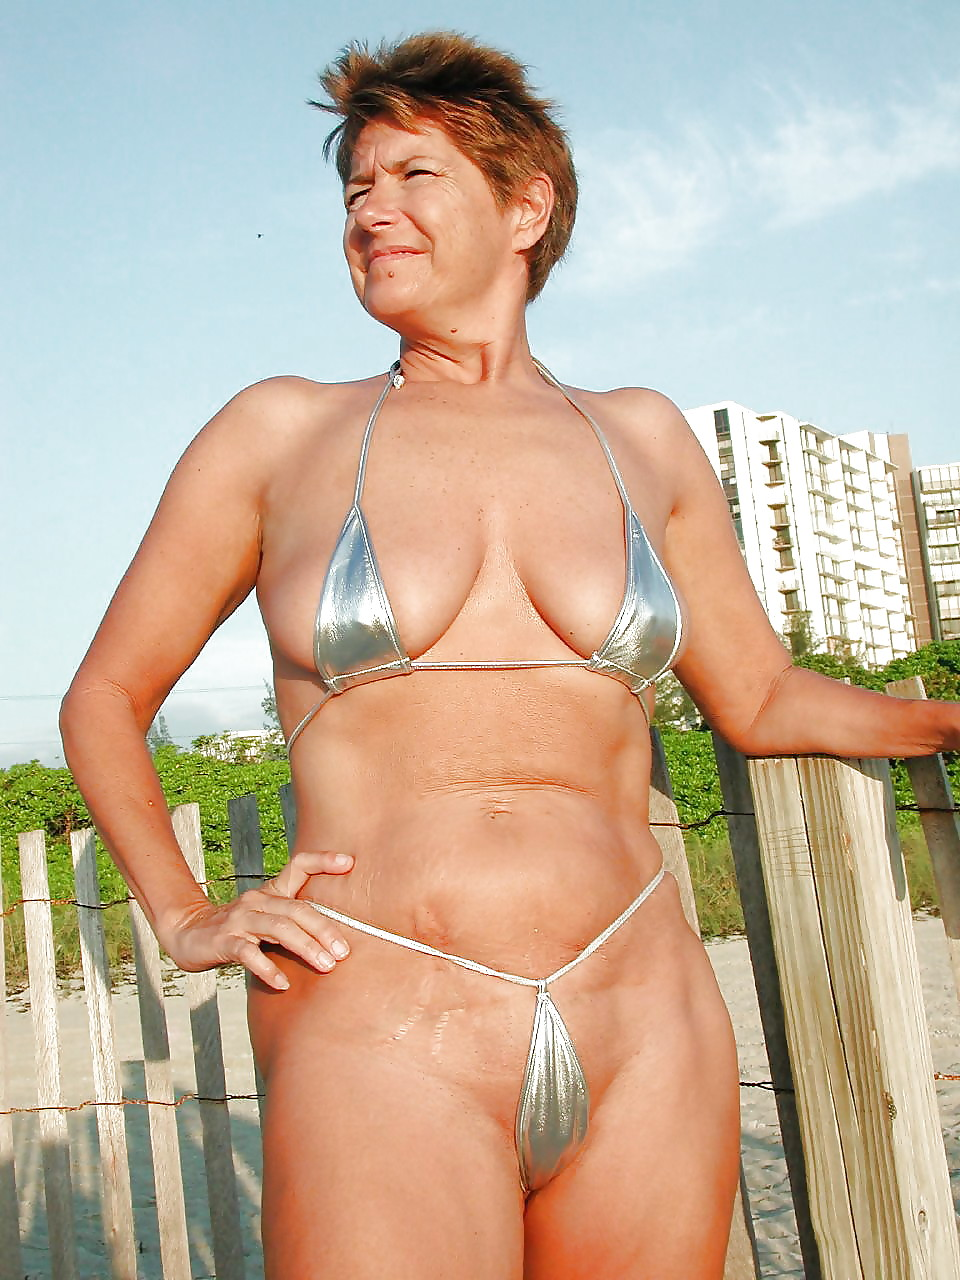 Korean pussy granny bikini slut pictures amatuer petite eaton centre